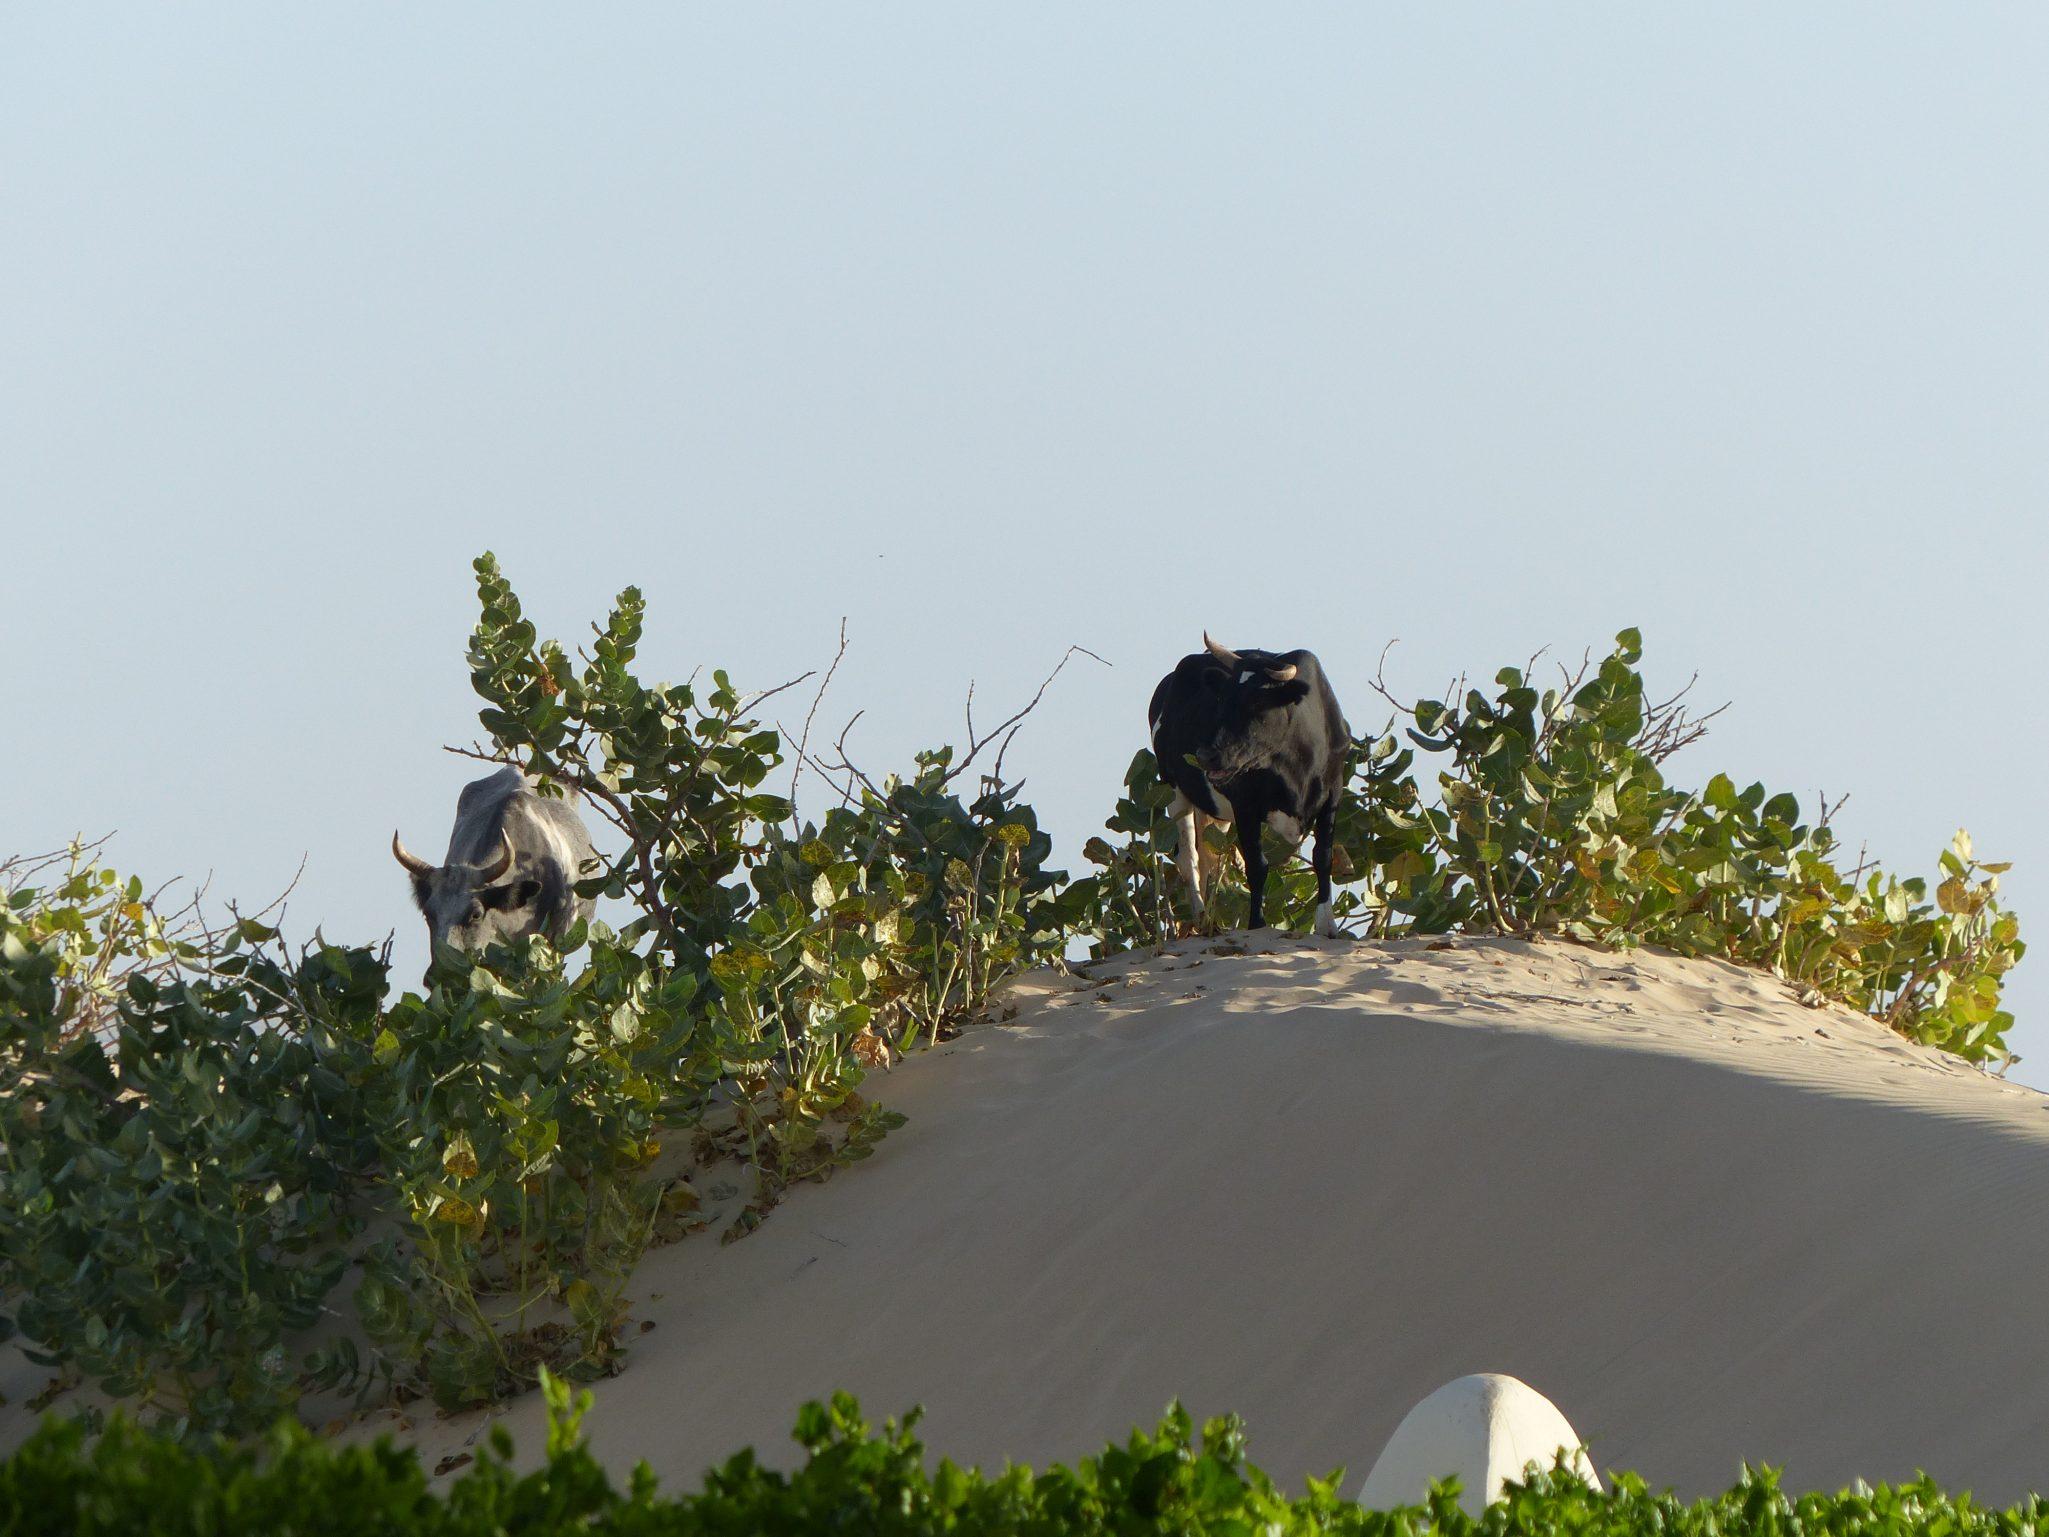 Kühe in der Sanddüne Sträucher Boha Vista